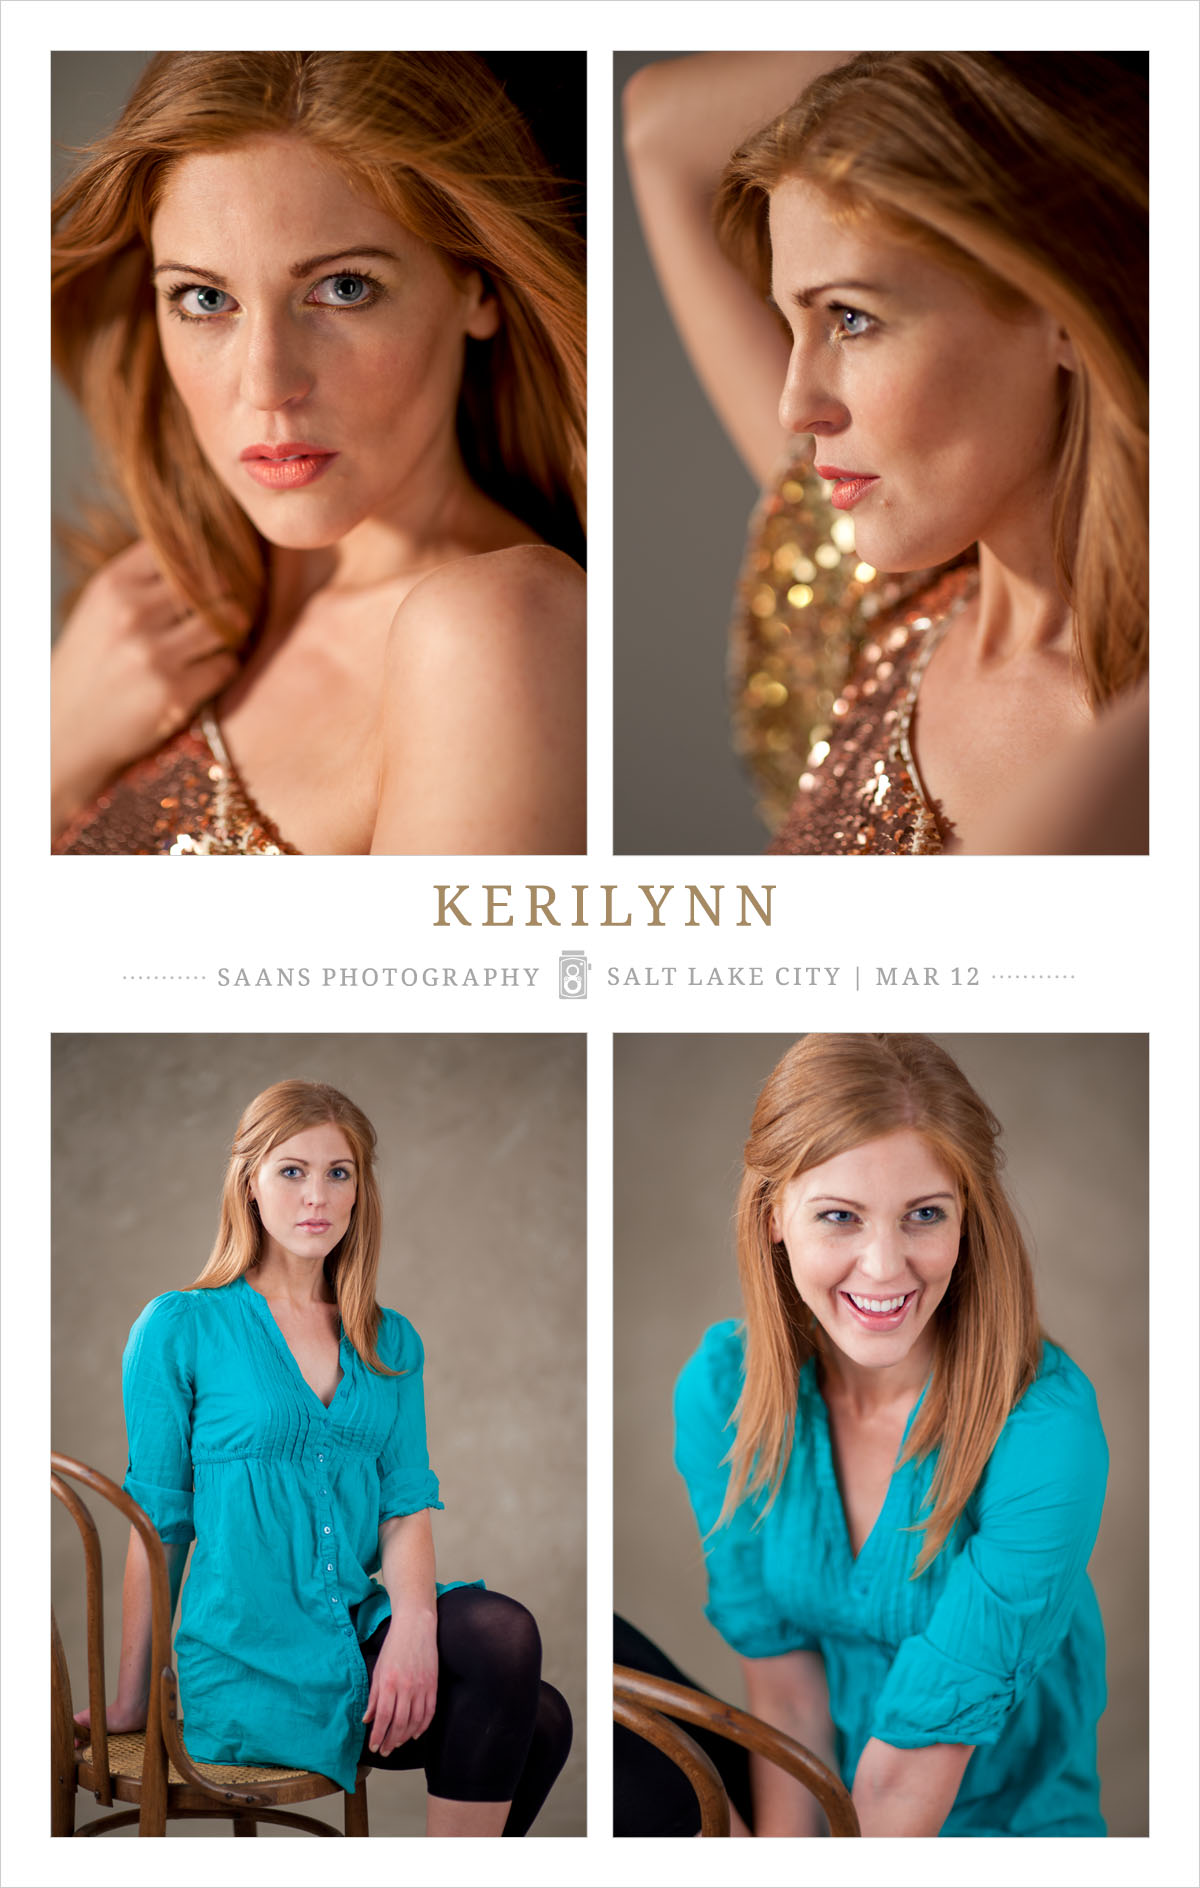 Kerilynn